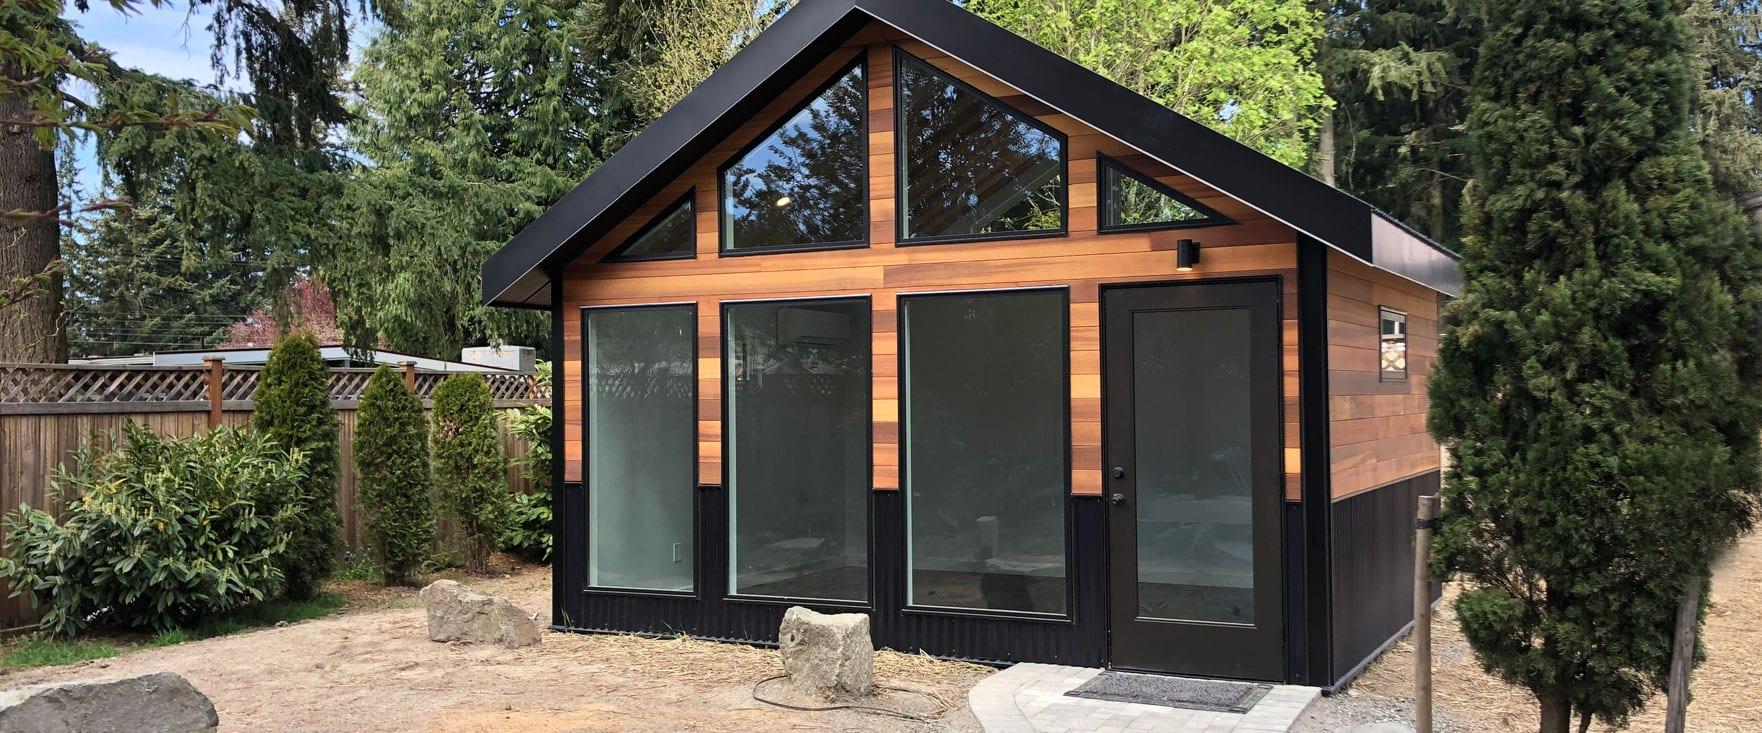 Modern Gabled Roof Shed Studio Shed